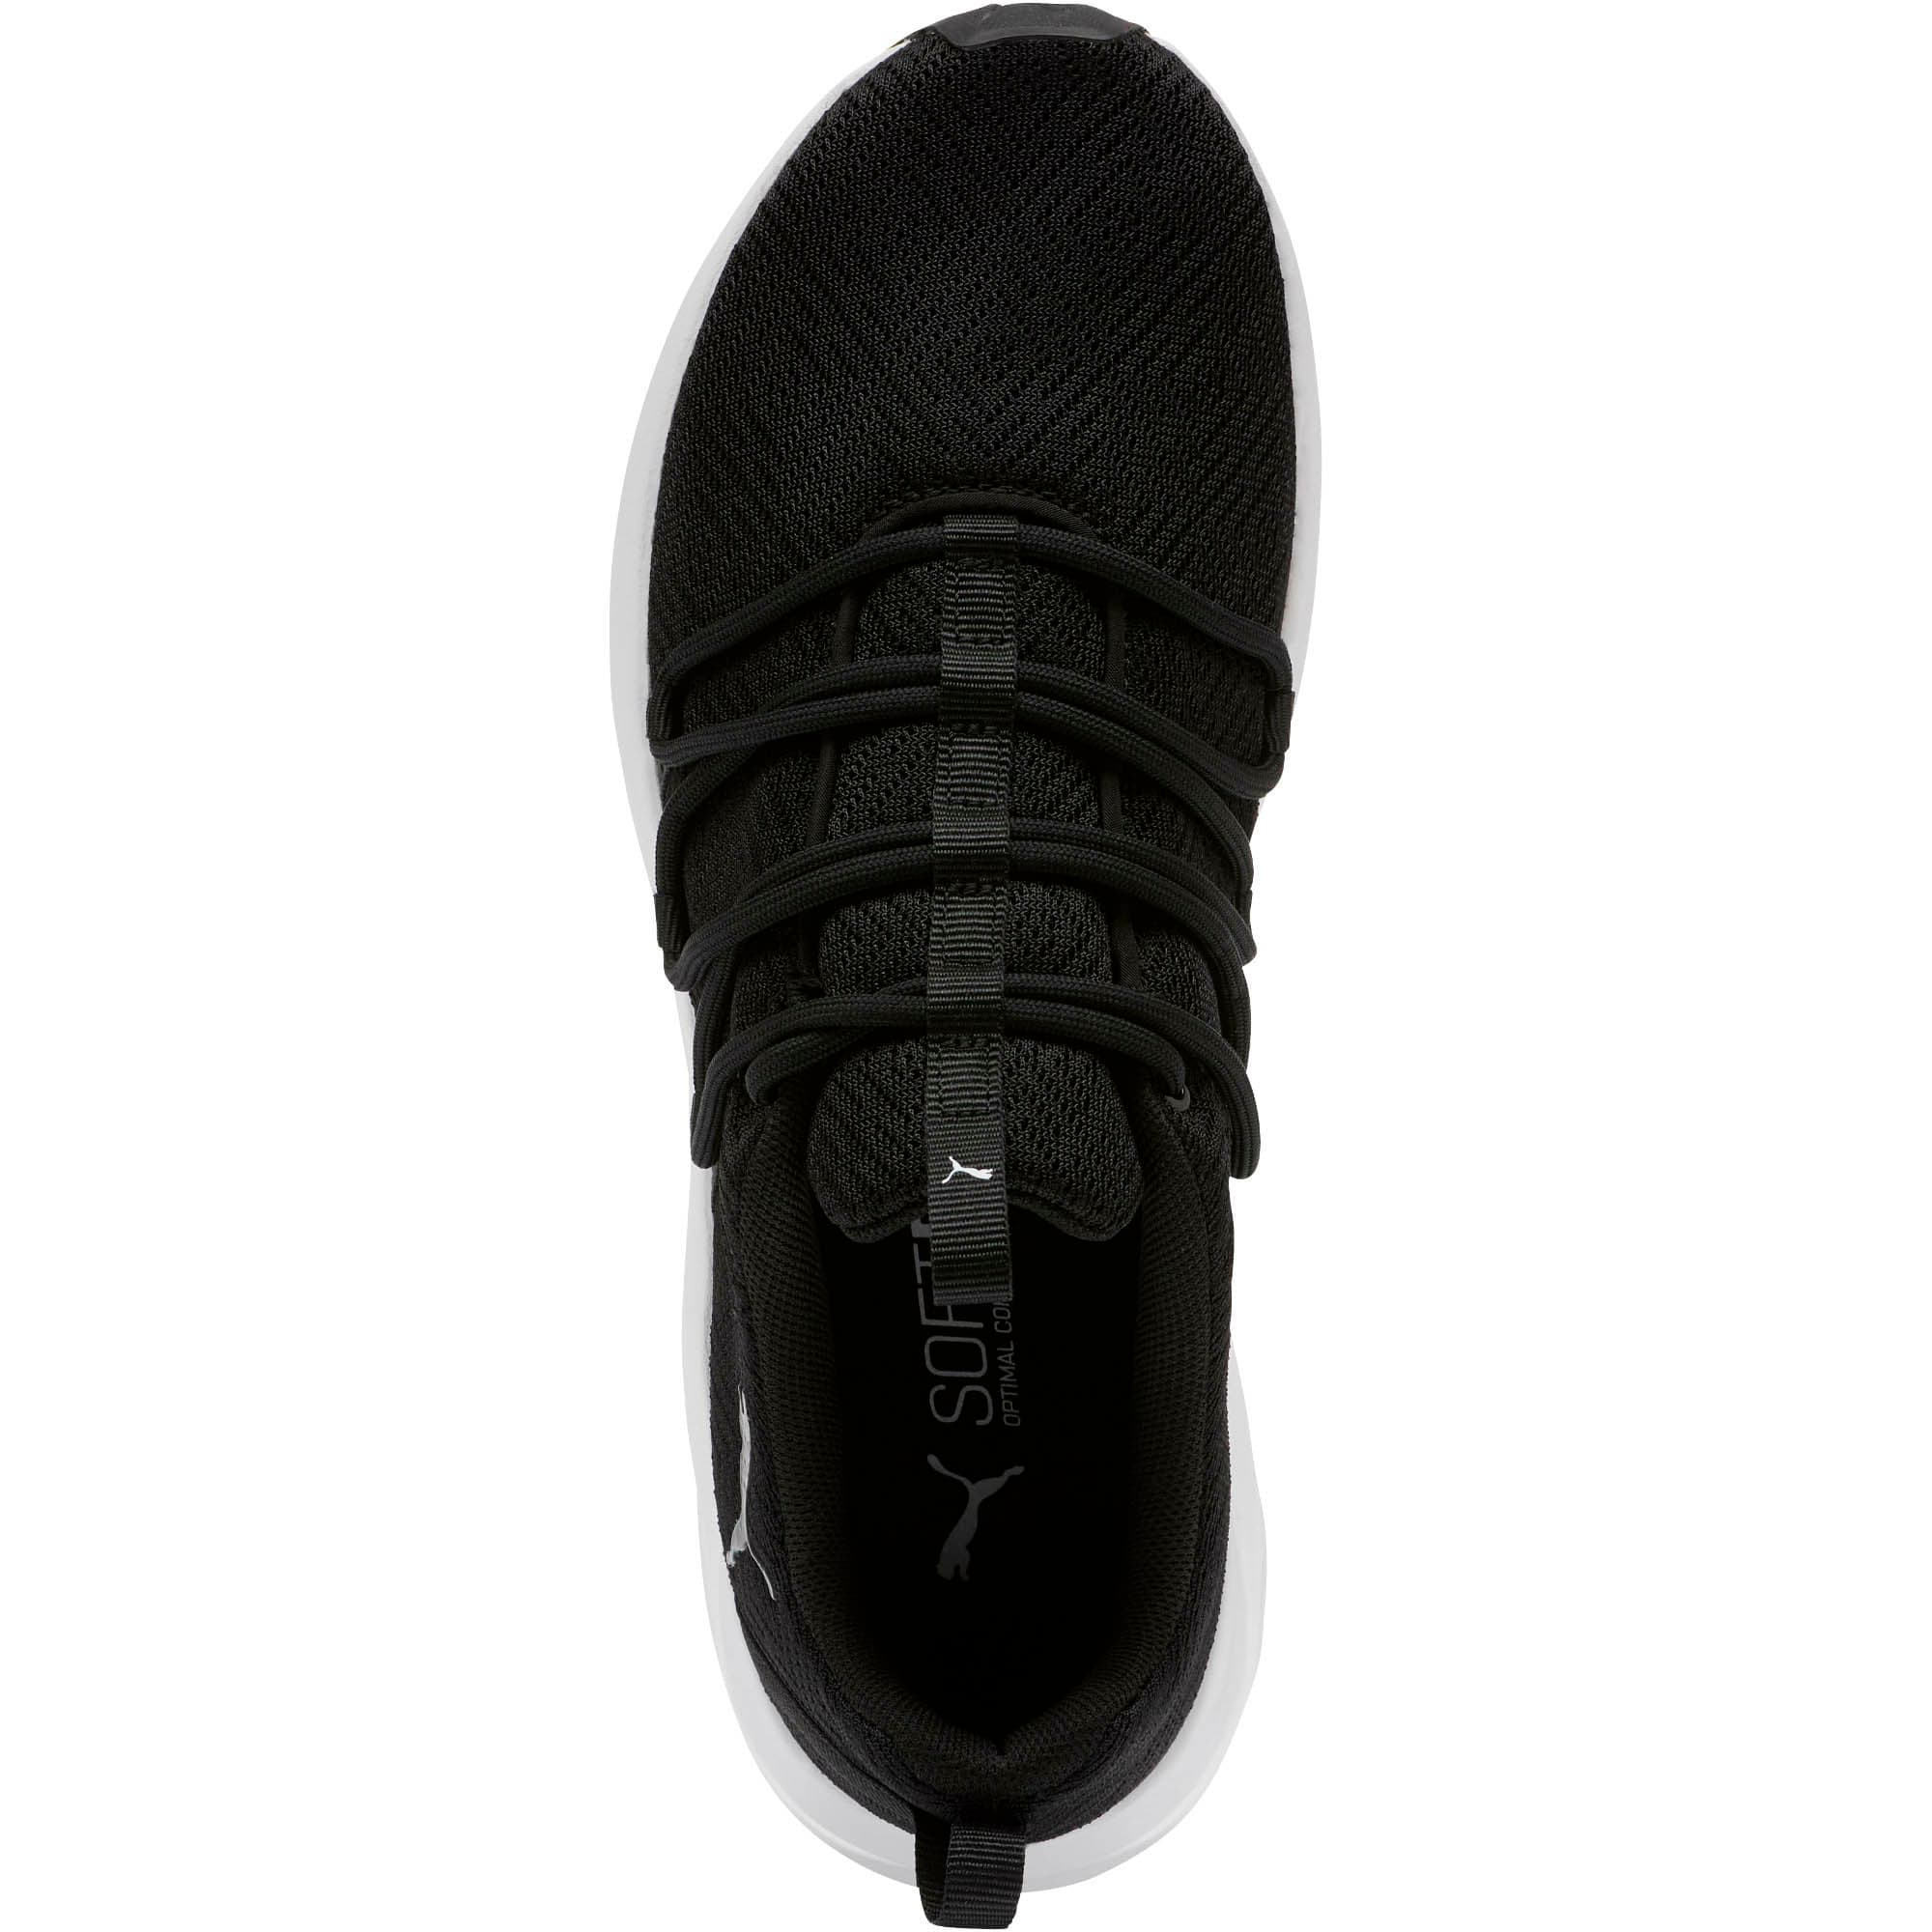 Thumbnail 5 of Prowl Alt Stellar Women's Training Shoes, Puma Black-Puma White, medium